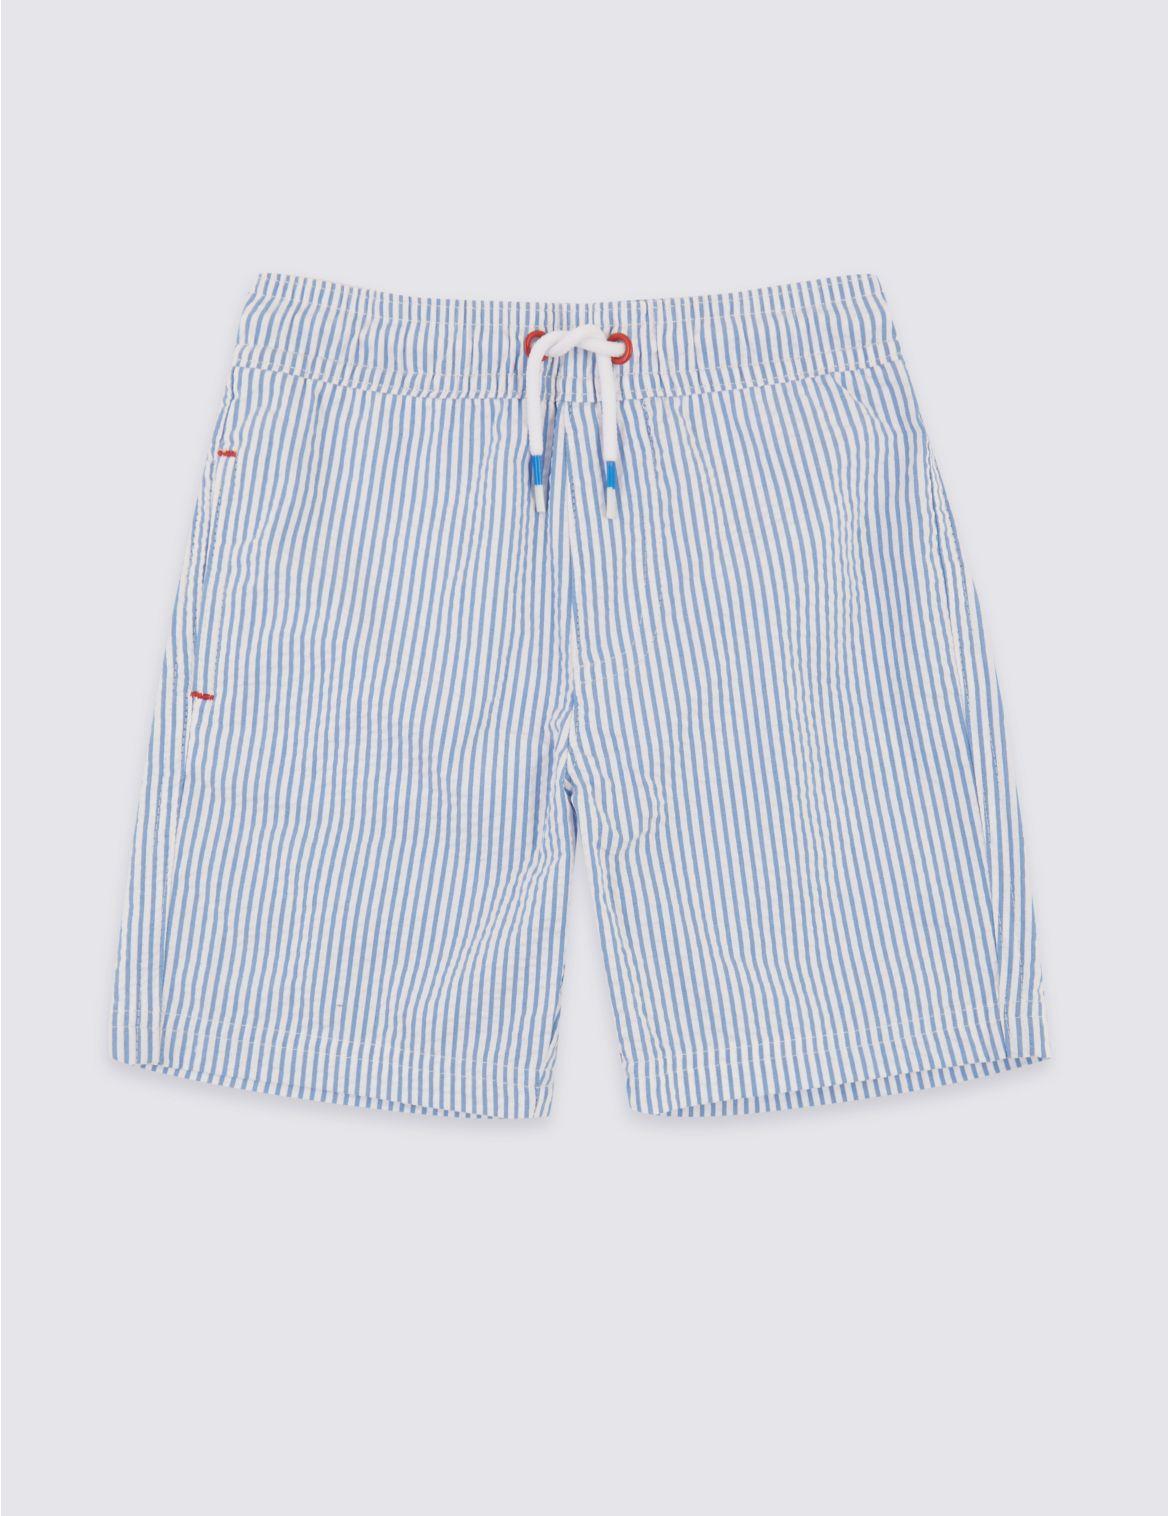 4b2bdfd6b6 Marks & Spencer Swim Shorts with Sun Smart UPF50+ (3 Months - 7 Years)